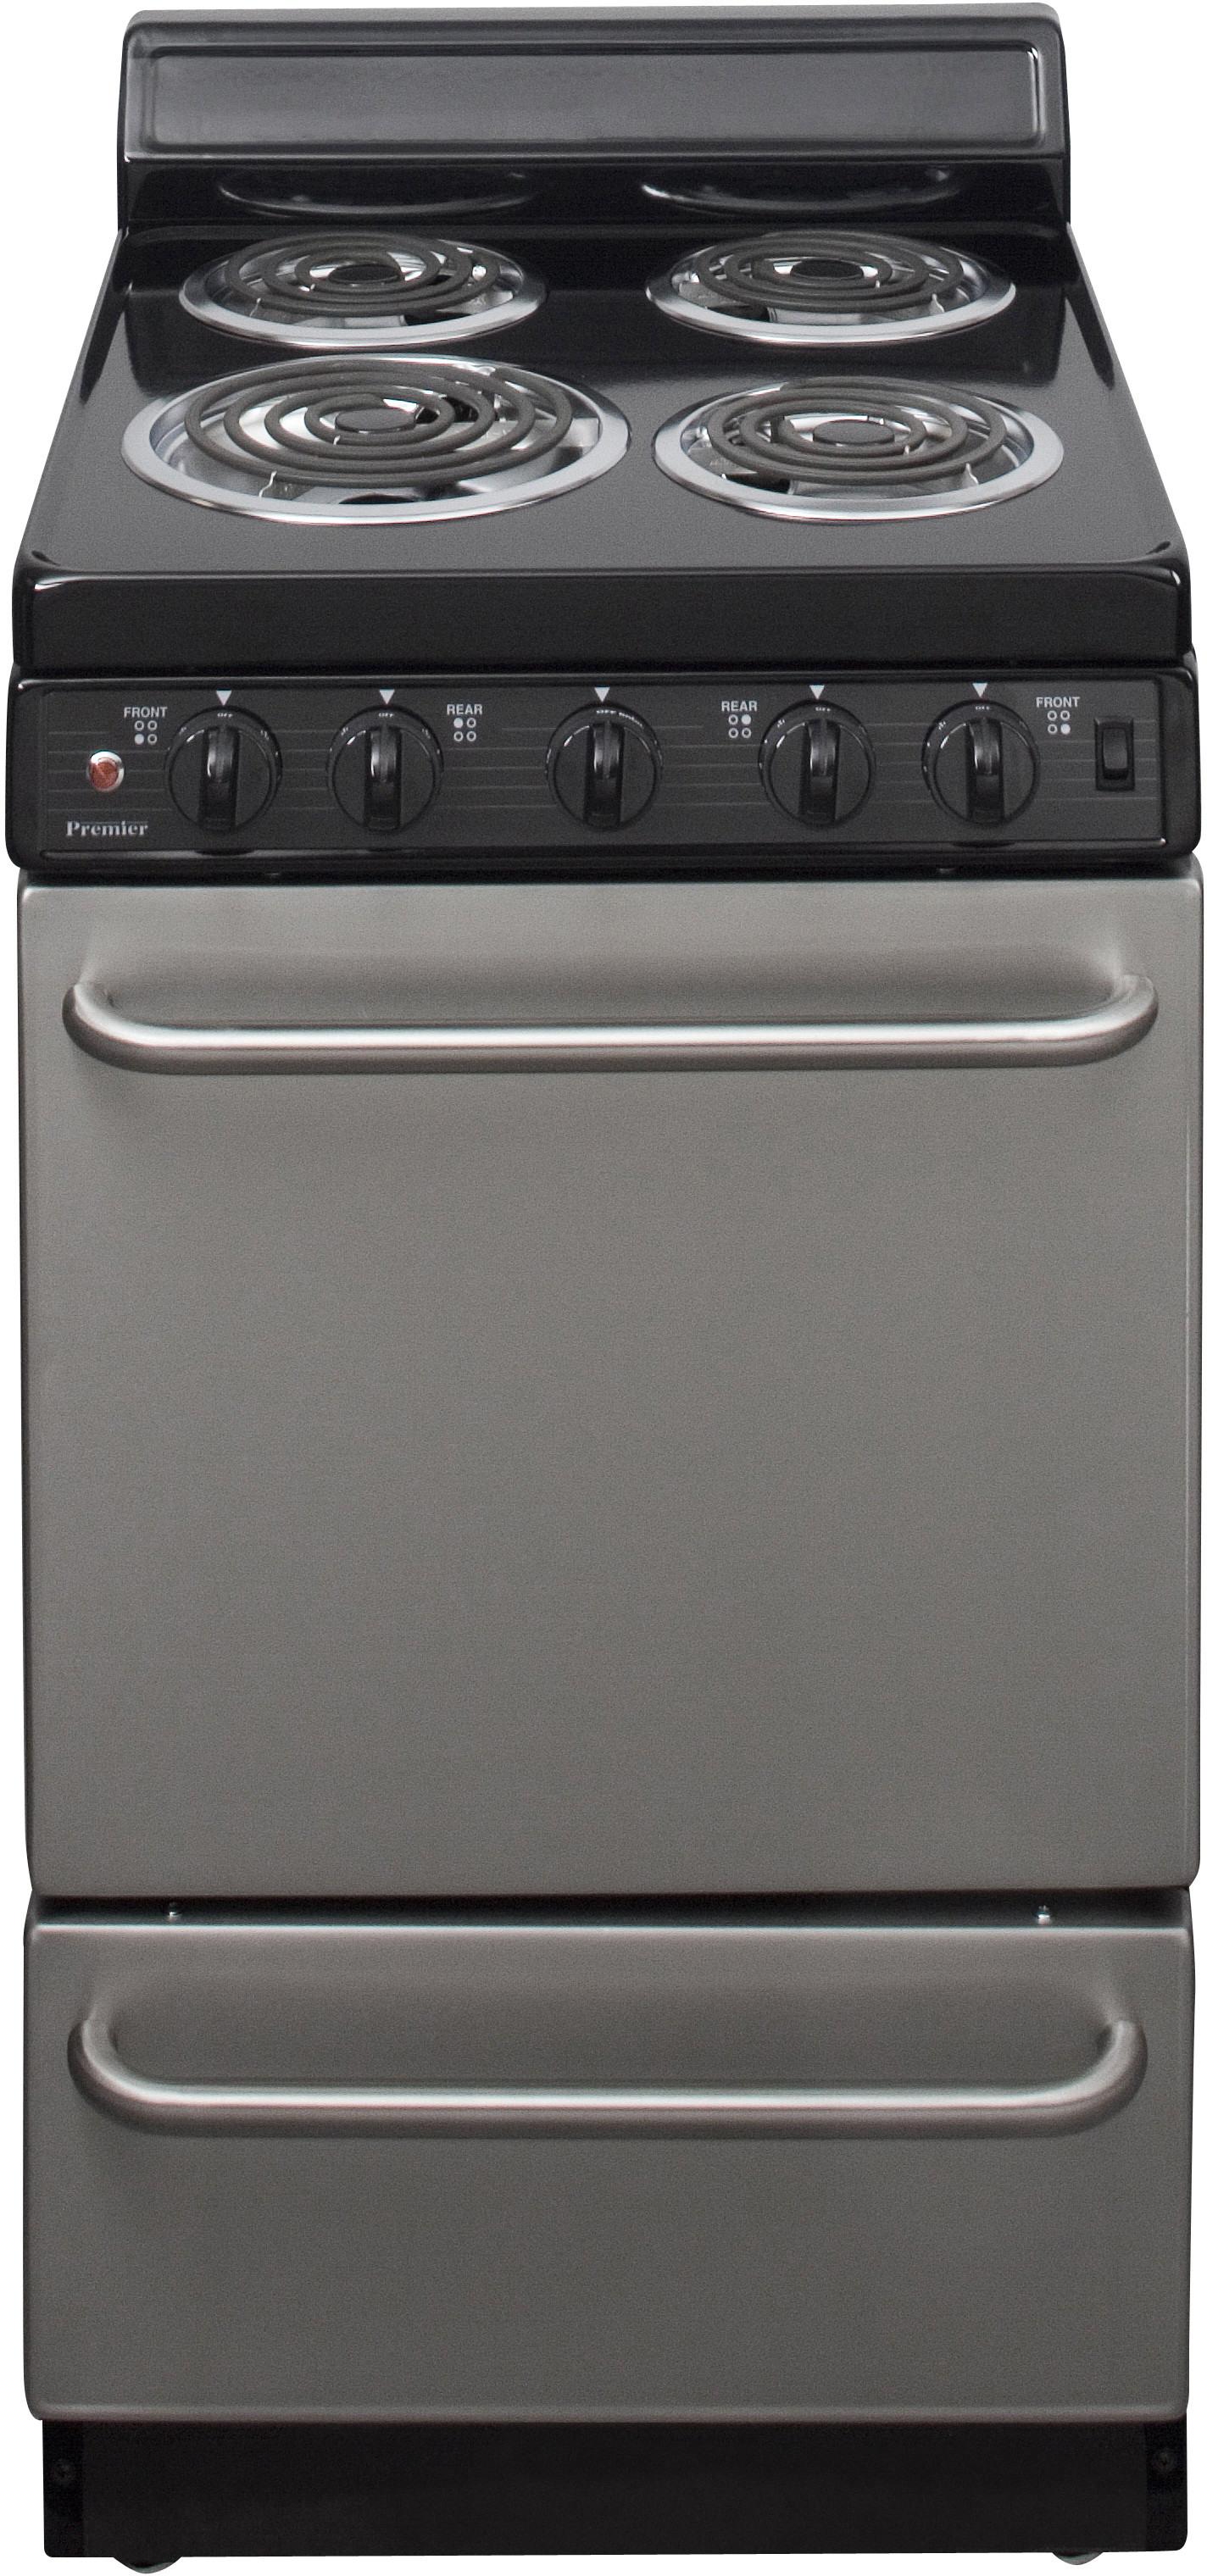 Premier Eak600bp 20 Inch Freestanding Electric Range With